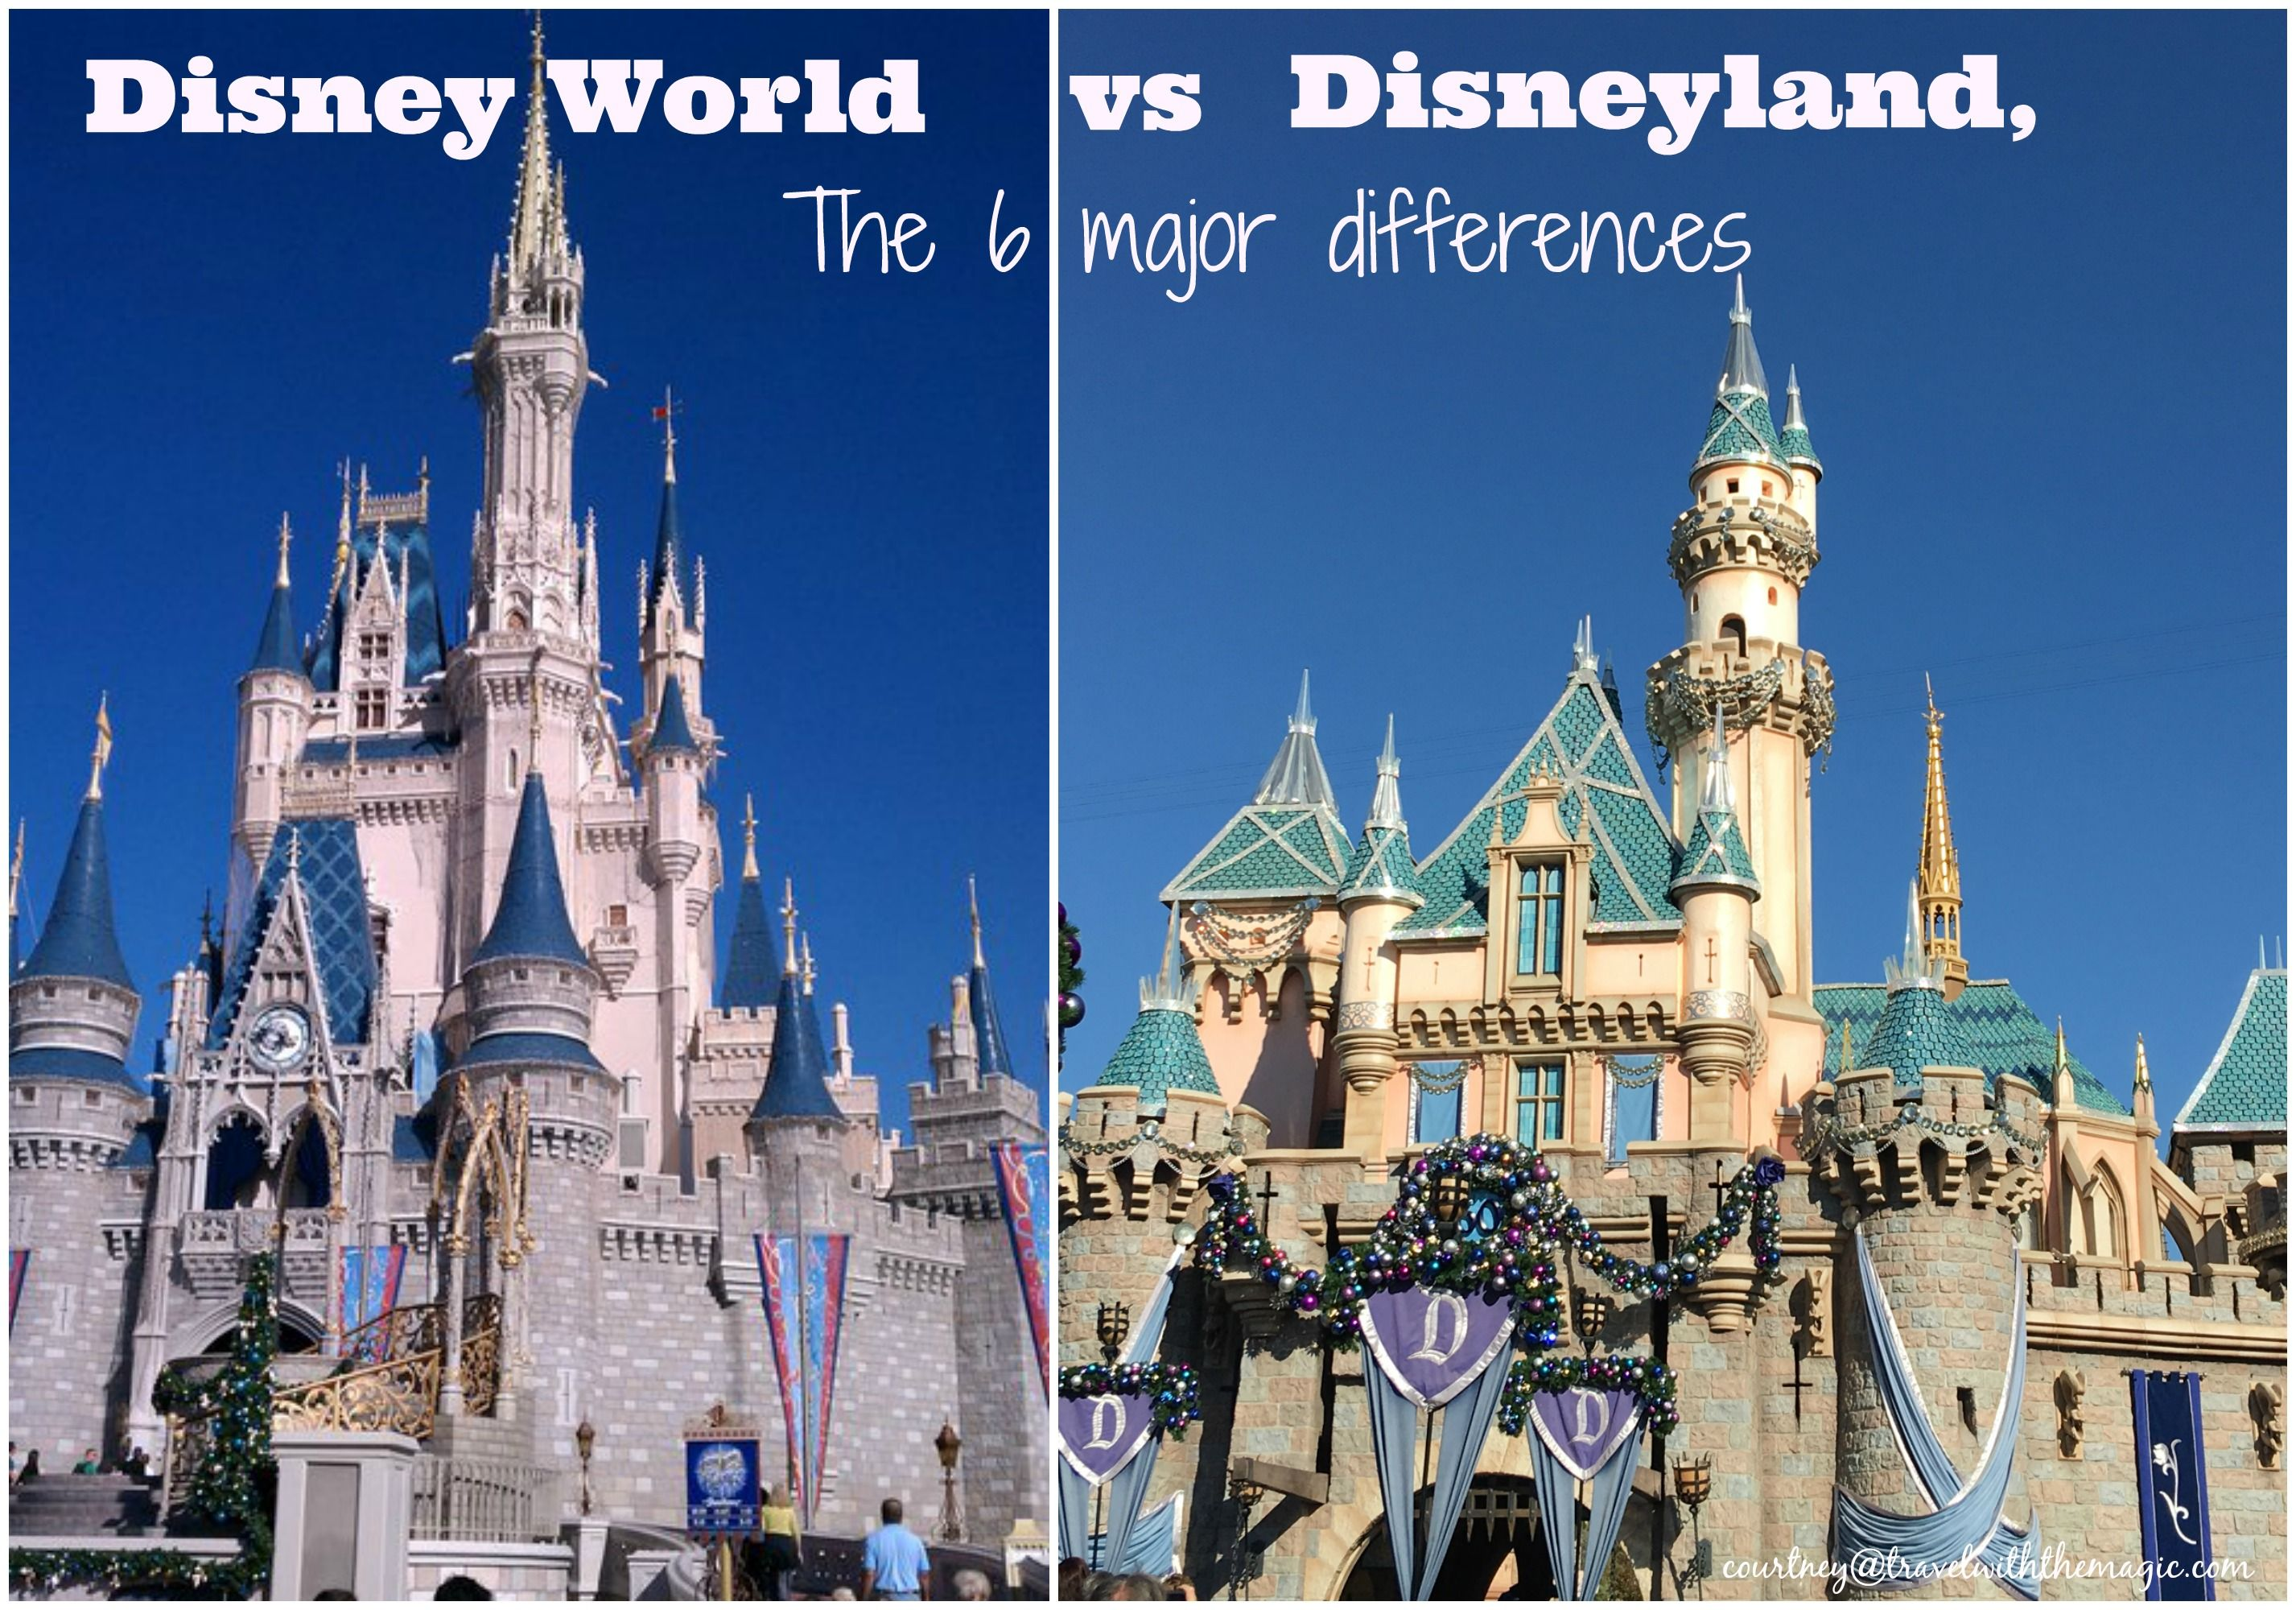 Disneyland Versus Disney World The 6 Major Differences With Images Disneyland Vs Disneyworld Disneyland Vacation Disney World